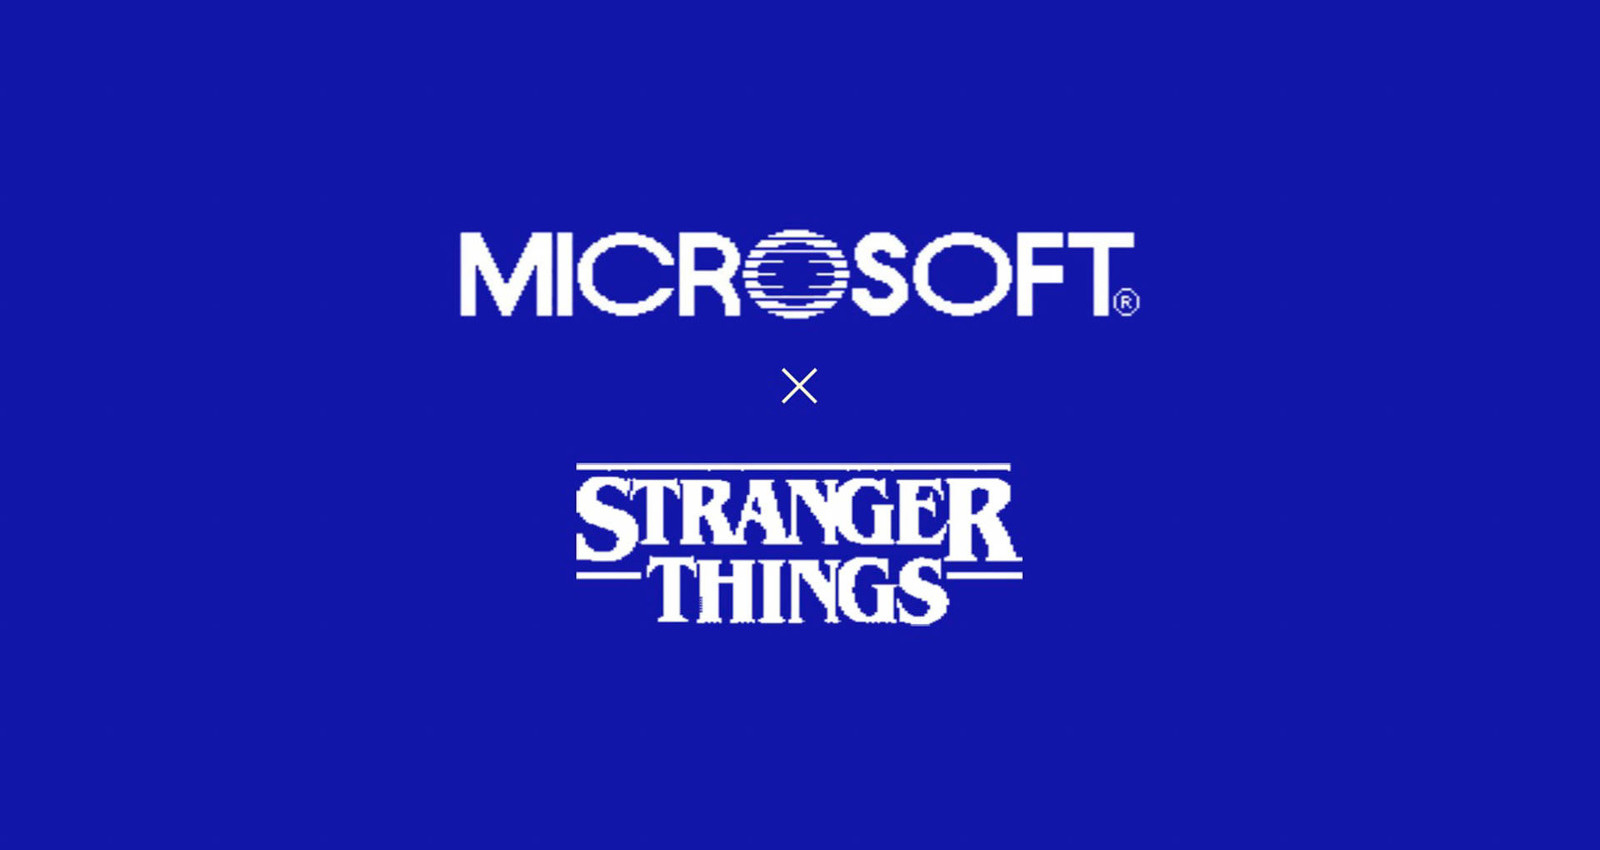 Microsoft and Netflix: A Big Strange Partnership